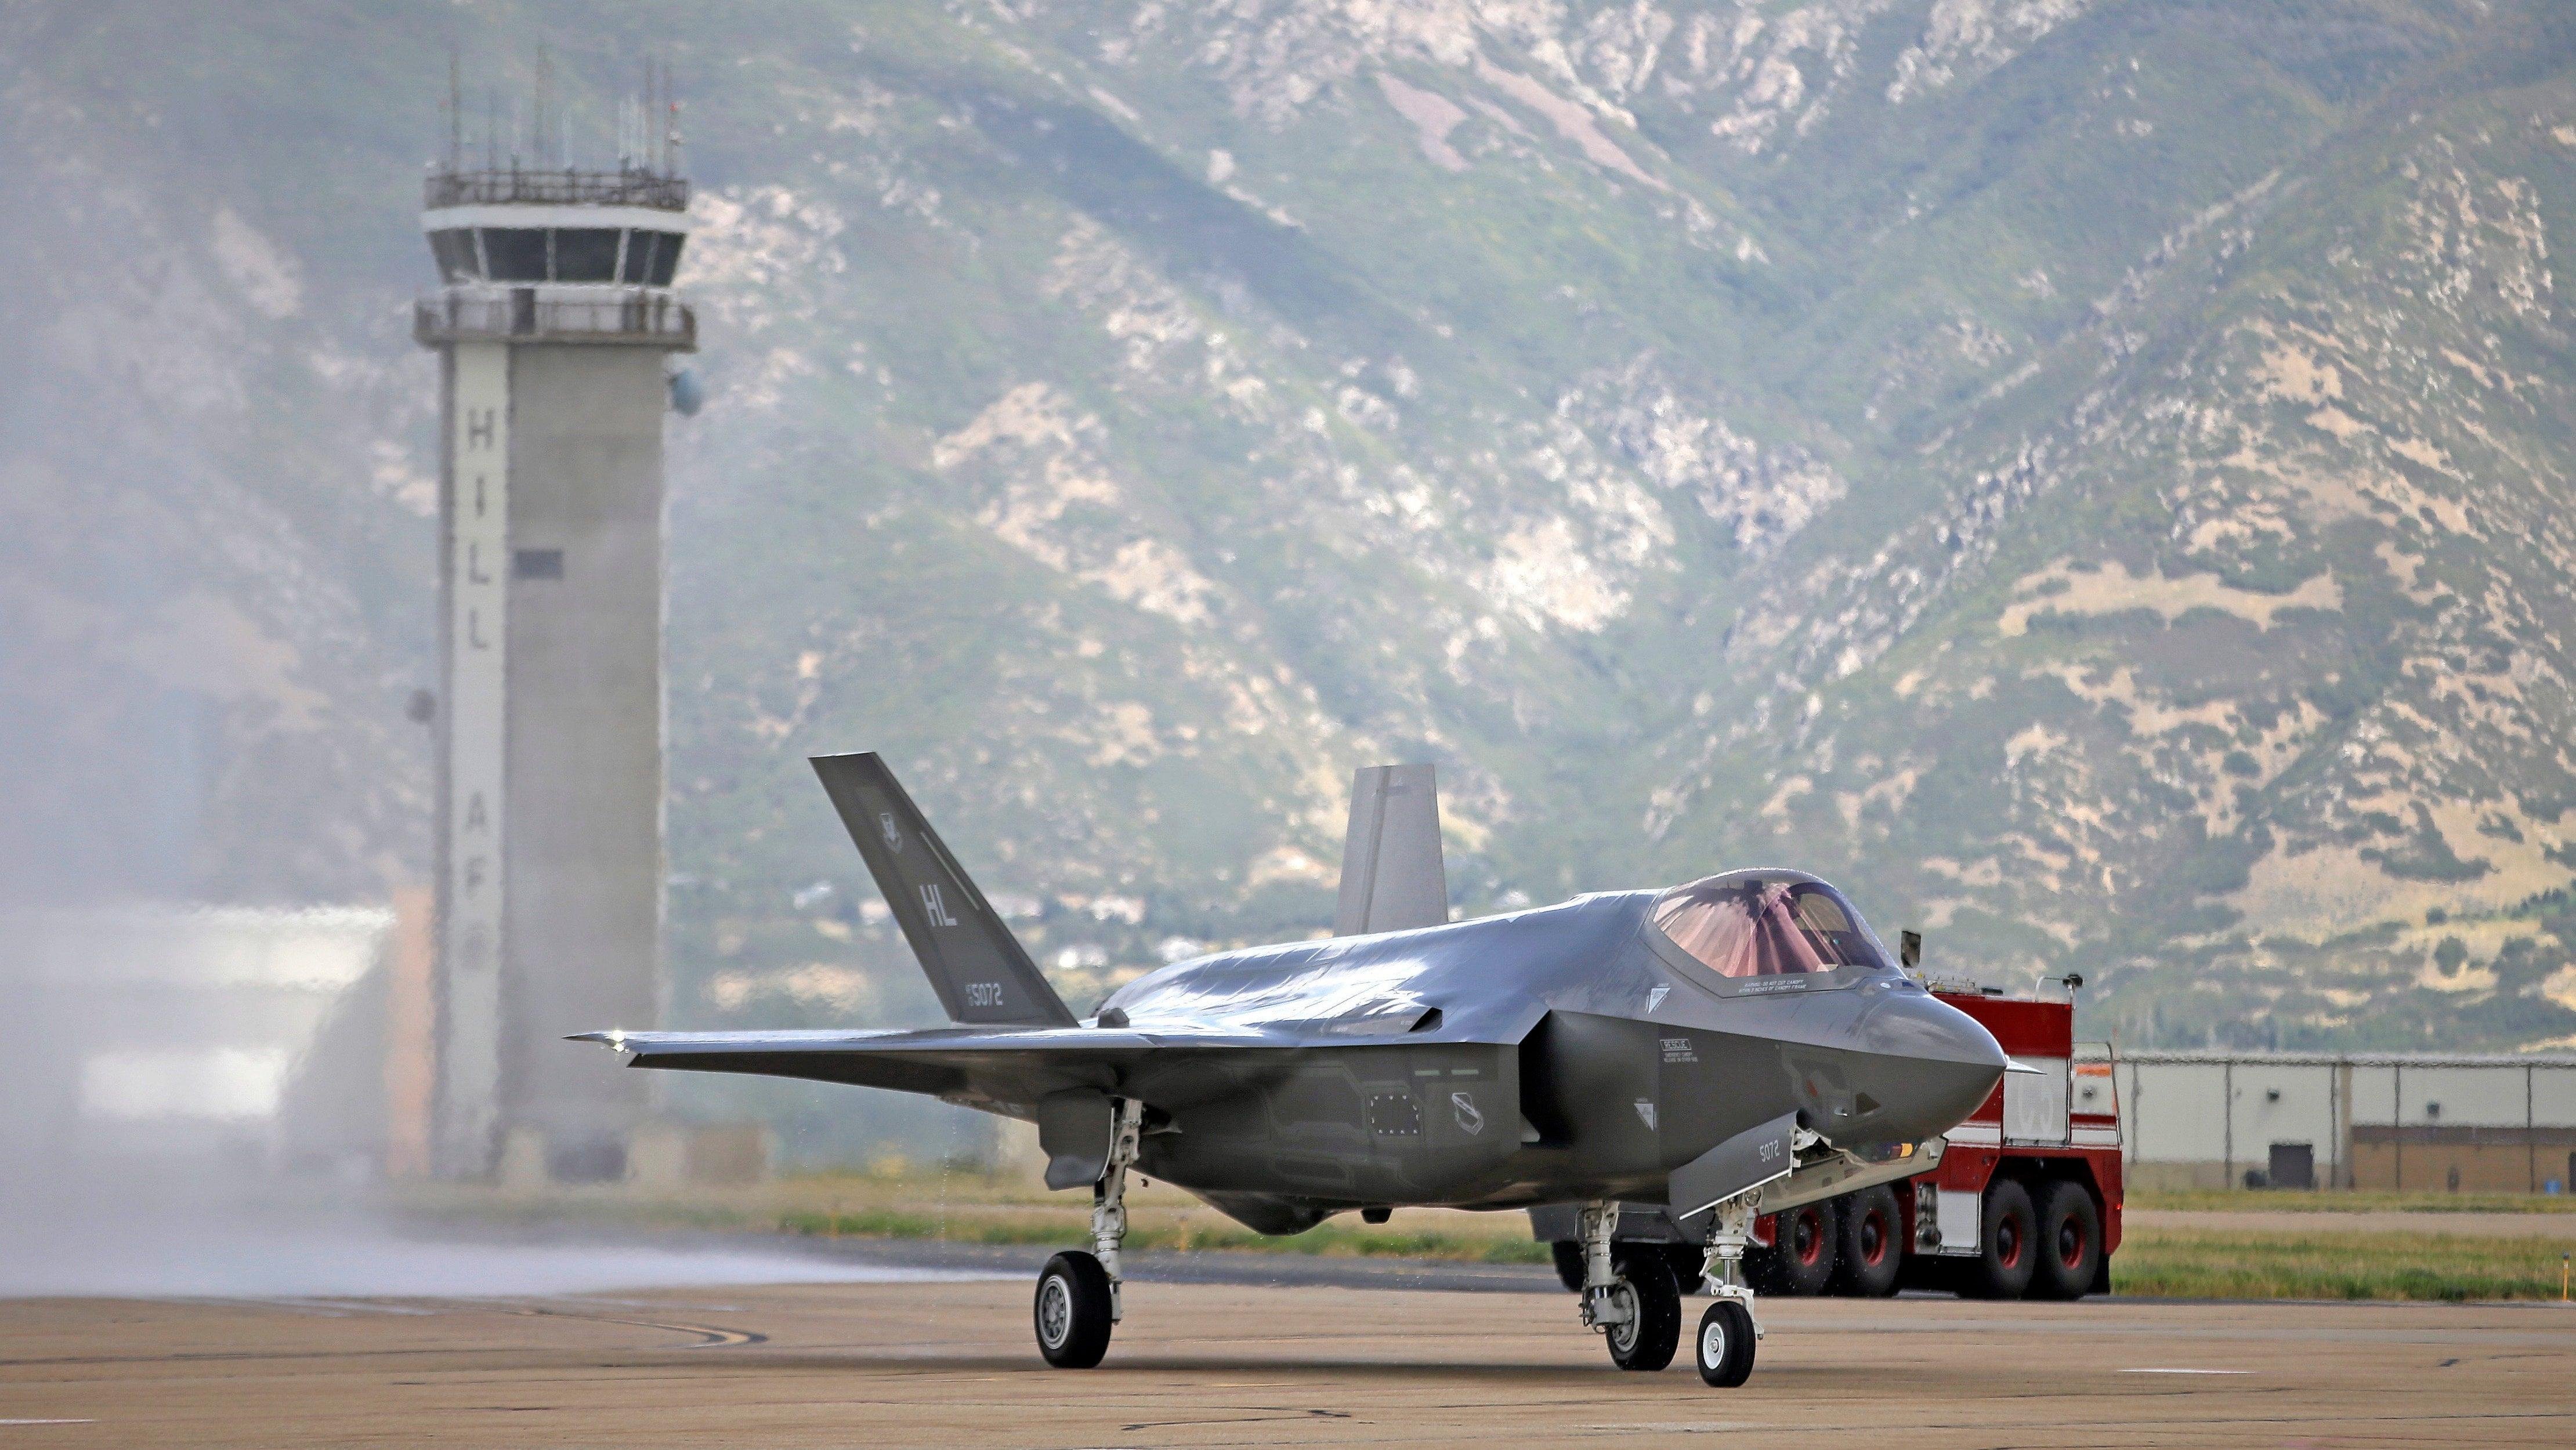 Pentagon Grounds Every F-35 Fighter Jet After Crash